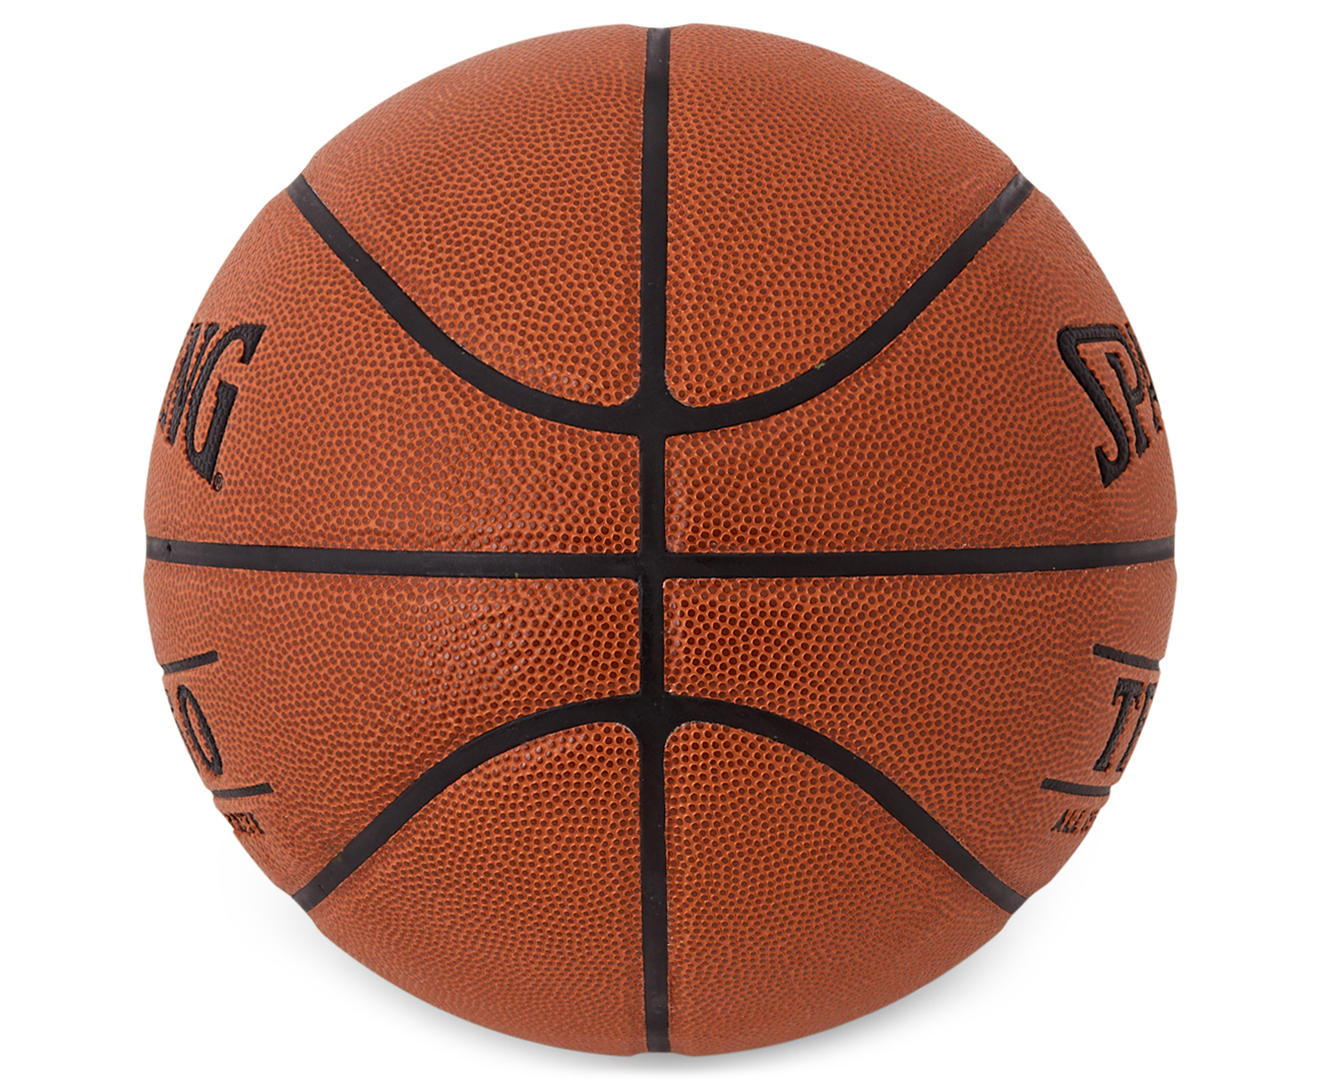 Spalding TF-250 Size 7 All Surface Basketball - Orange ...